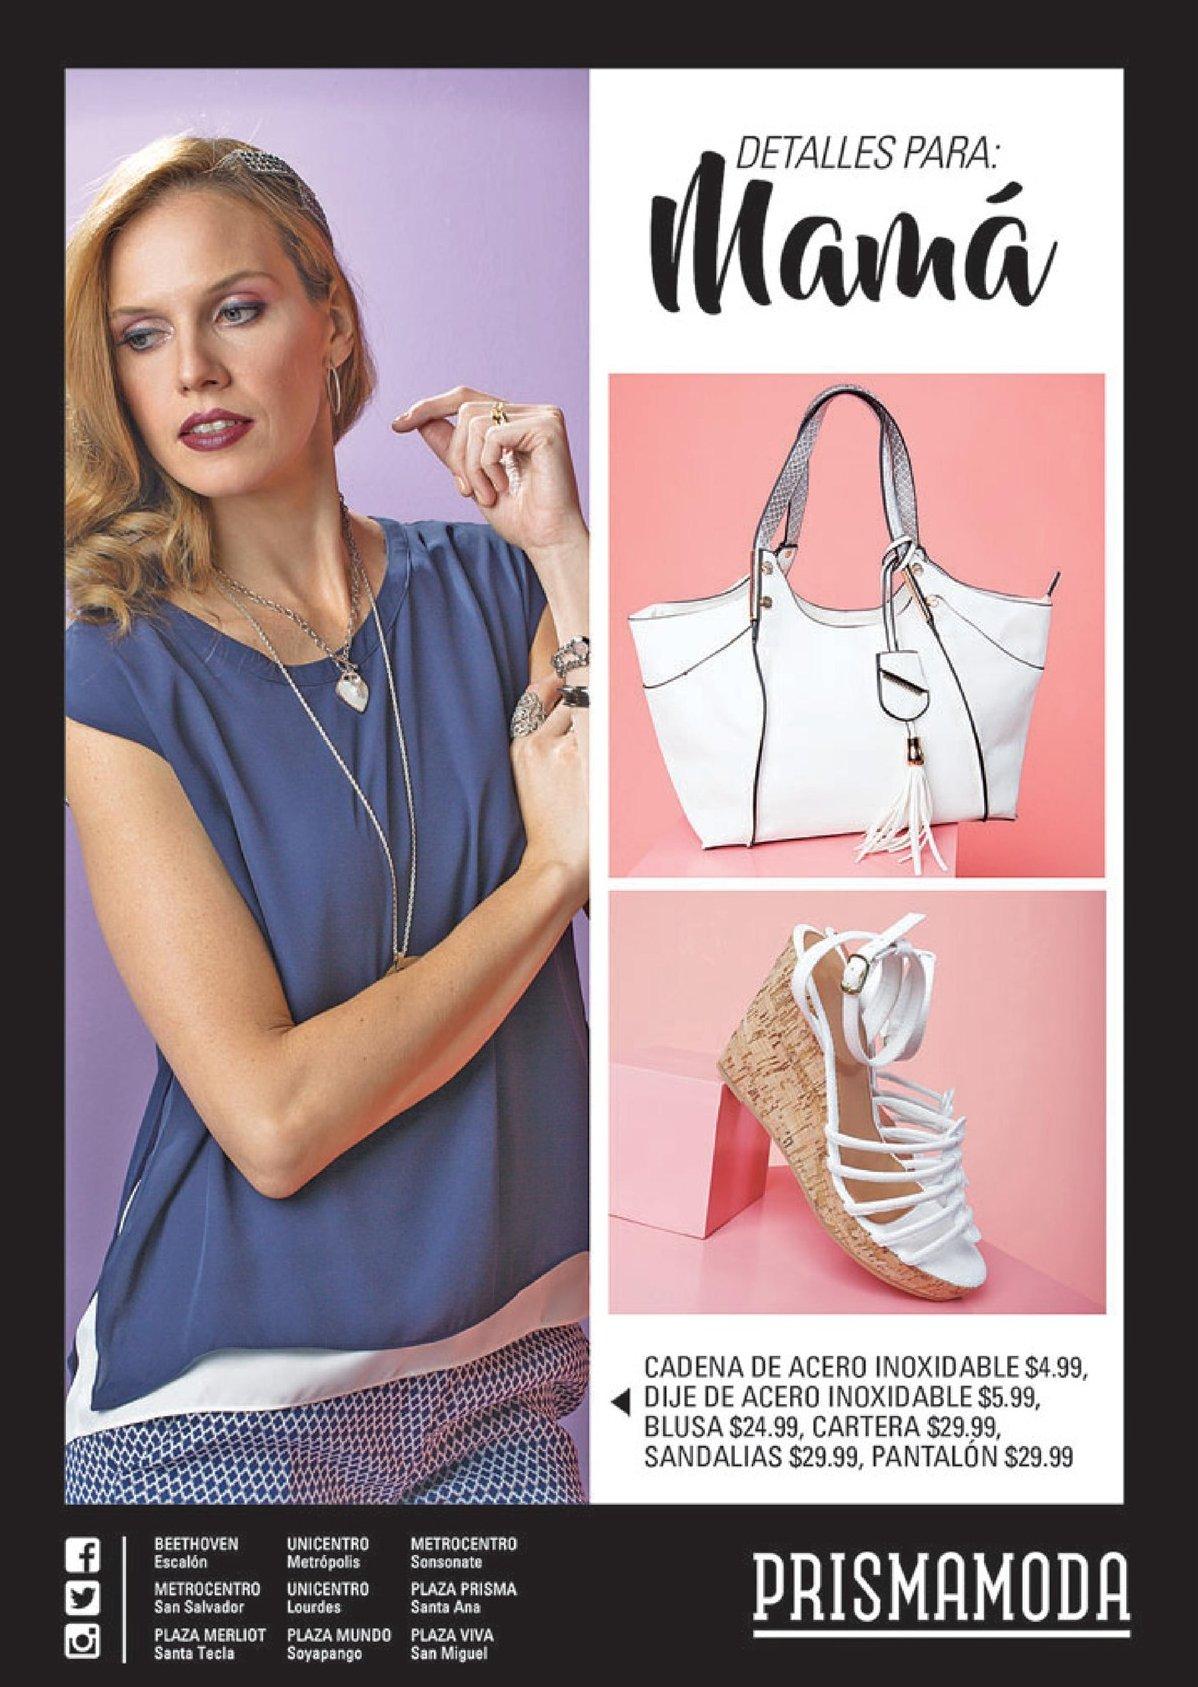 Detalles para mama en mayo 2017 prisma moda